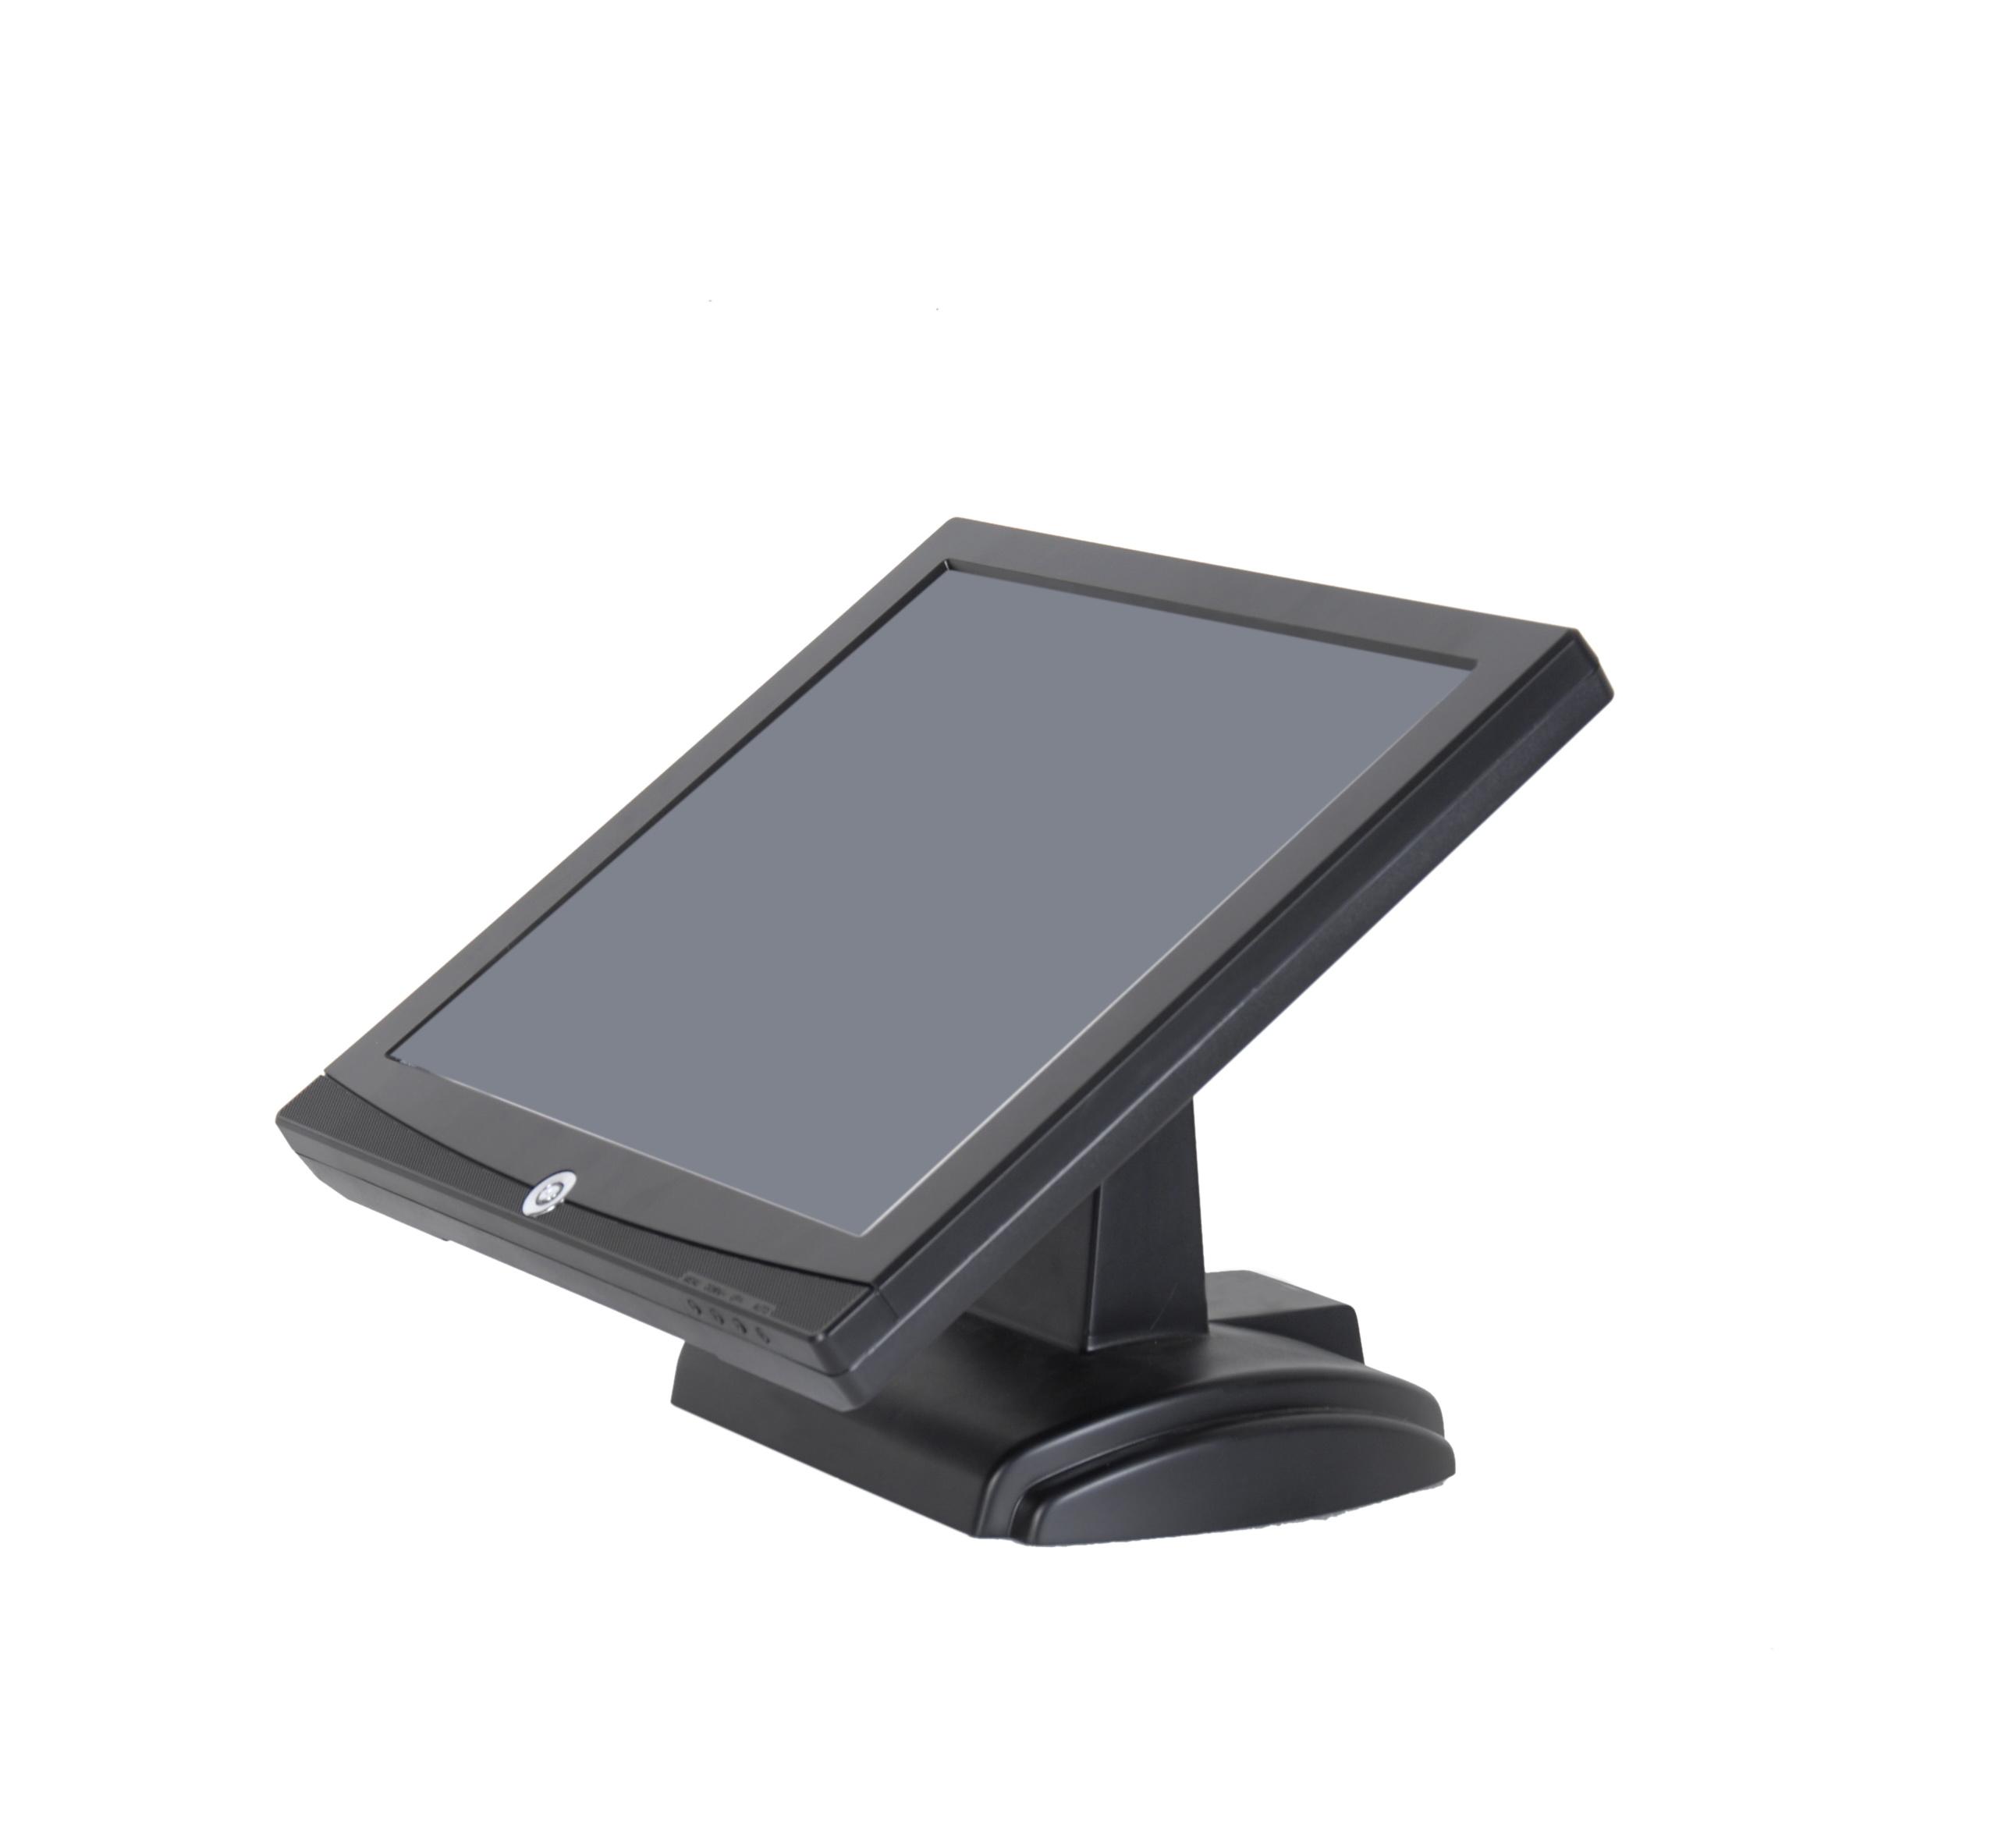 SJZZ-GL-15-01 触摸显示器